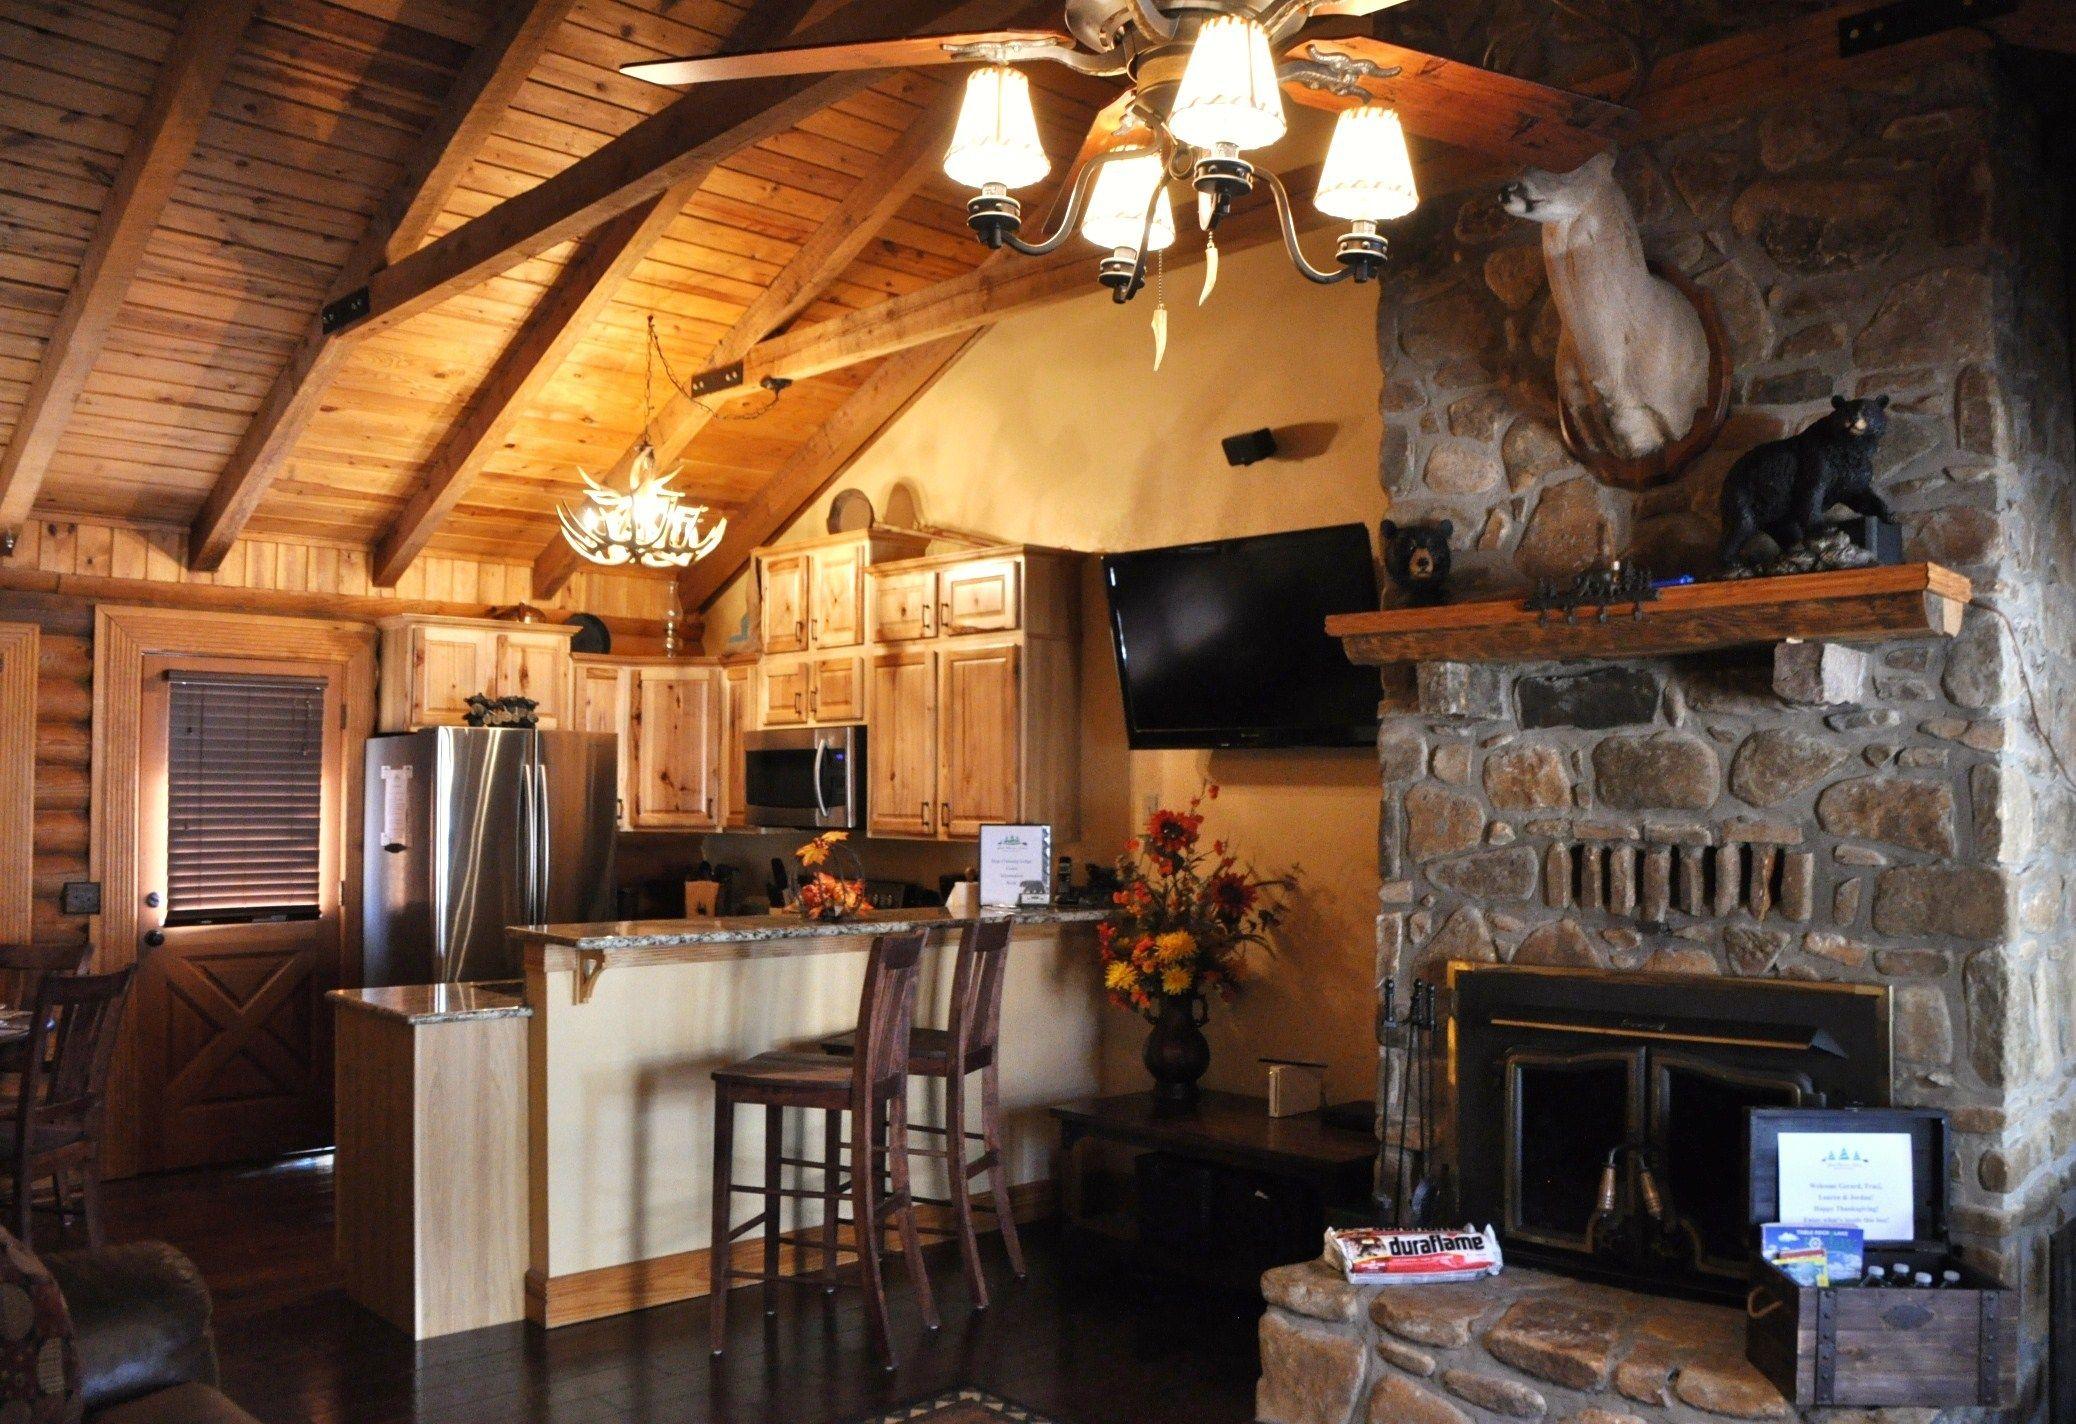 Great Branson Cabins Luxury Rental Cabins Lodges In Branson Mo Branson Cabins Luxury Rentals Branson